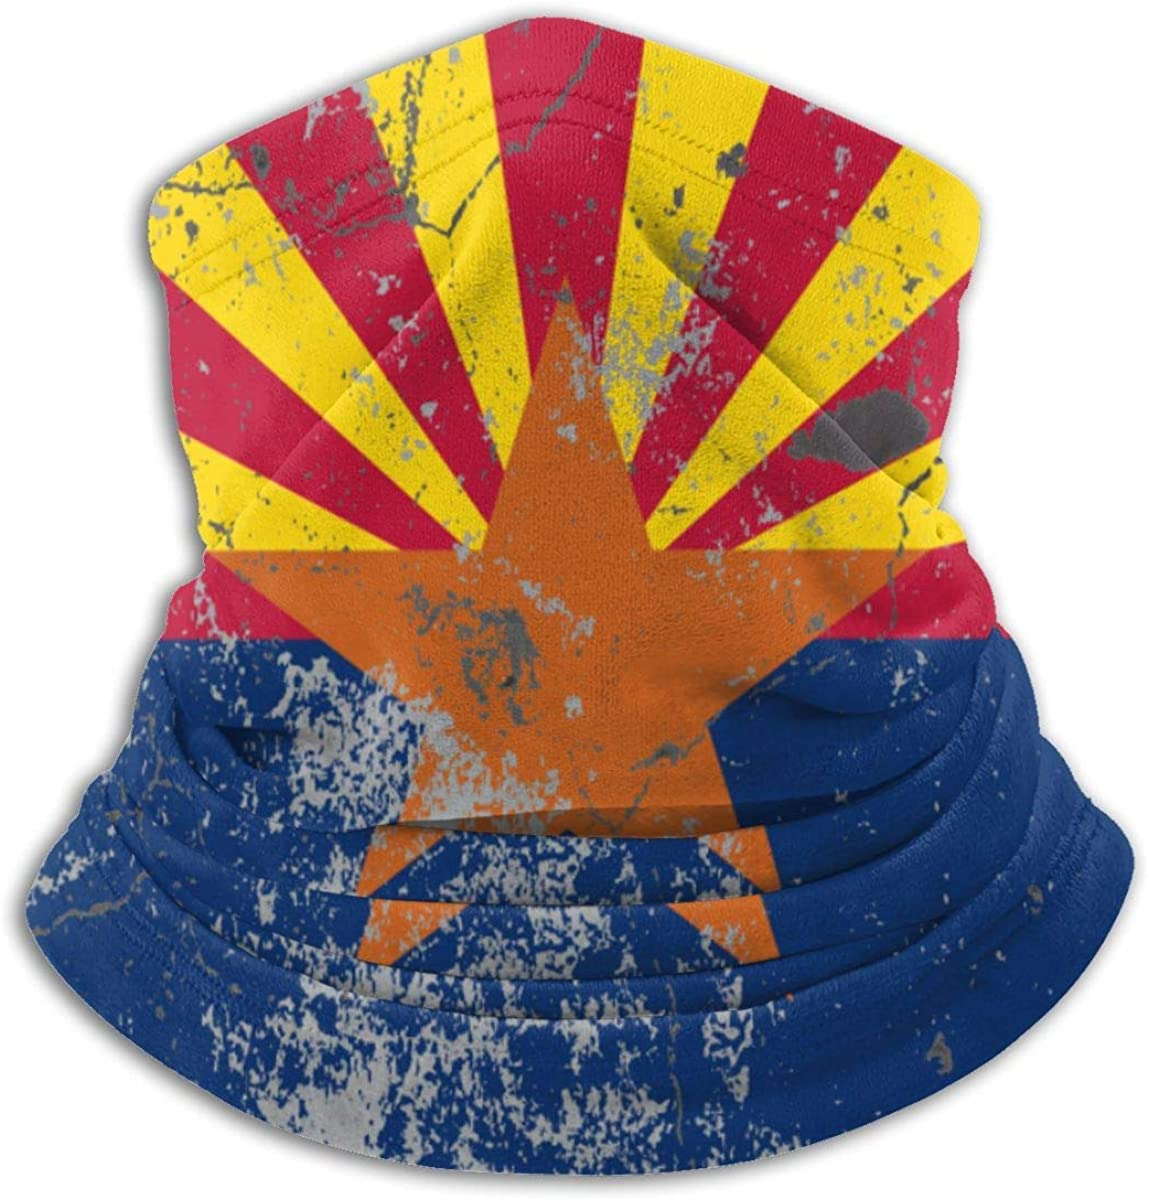 Arizona Flag Retro Neck Warmer Gaiter Balaclava Ski Mask Cold Weather Face Mask Winter Hats Headwear for Men Women Black